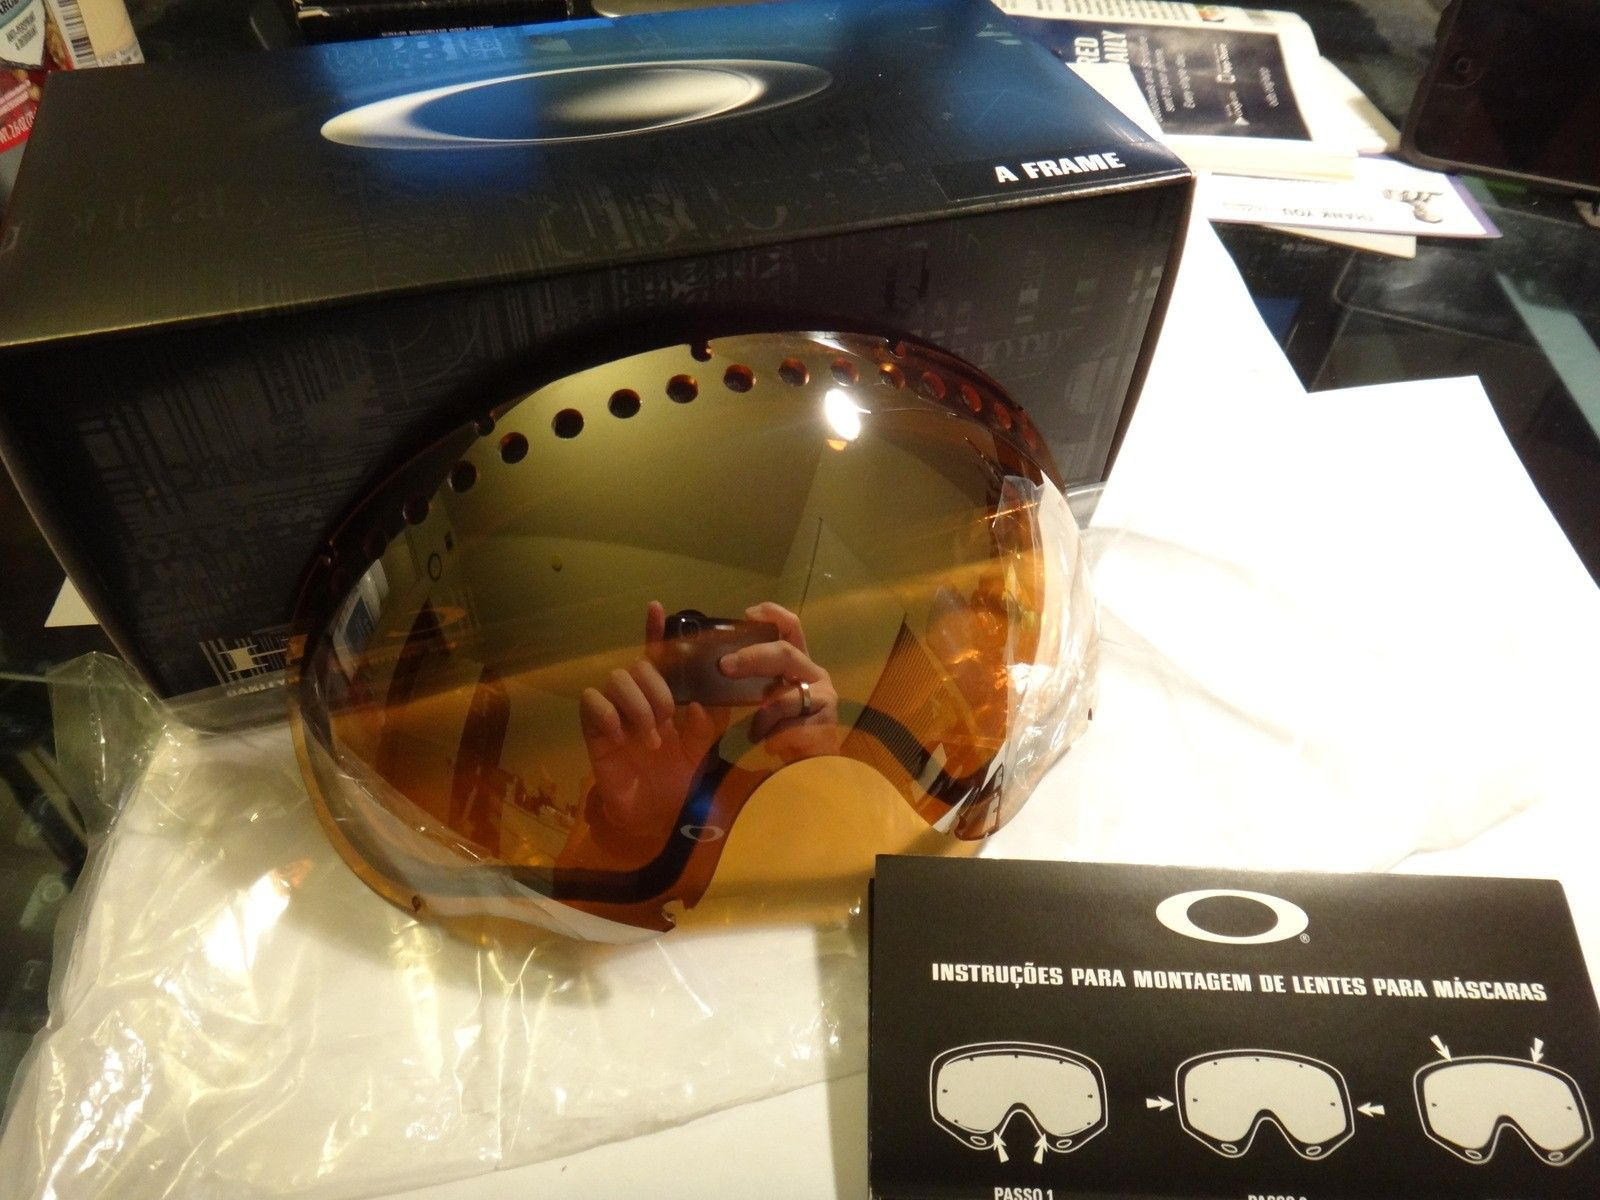 1st gen juliet, Juliet ruby lenses, snow goggle lens (A frame), juliet parts, wallet, boots - DSC07123.JPG